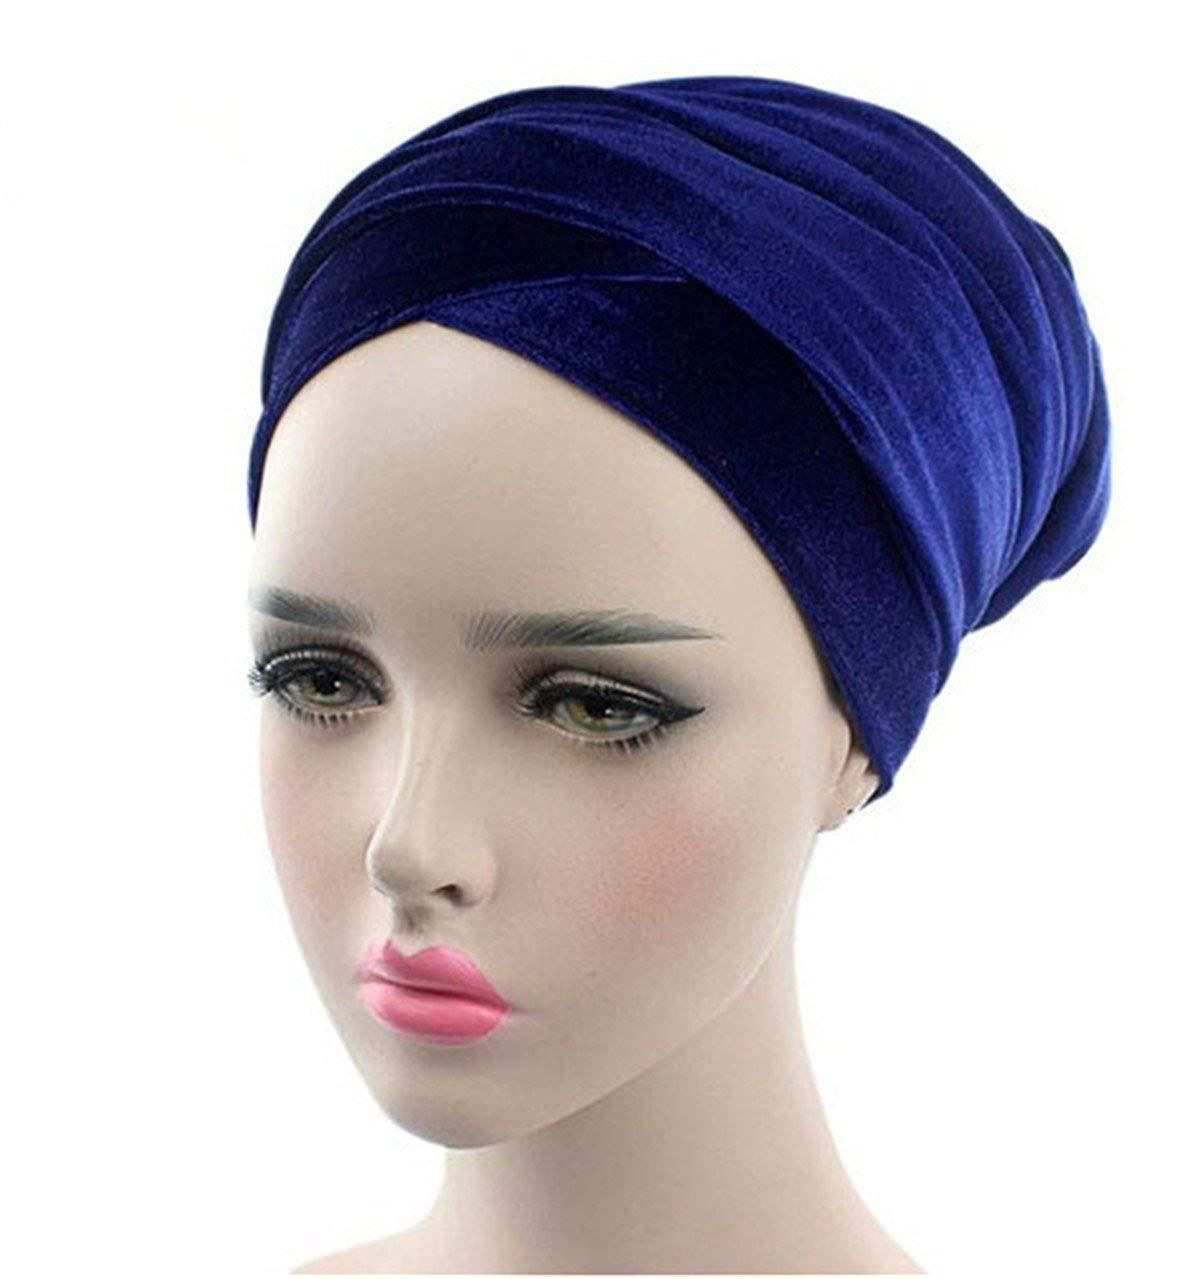 Scarica subito la foto giovane ragazza adolescente musulmana in hijab. World Traditional Clothing Womens Luxury Velvet Turban Hijab Cap Hat Extra Long Tube Head Wrap Scarves Clothing Shoes Accessories Vishawatch Com